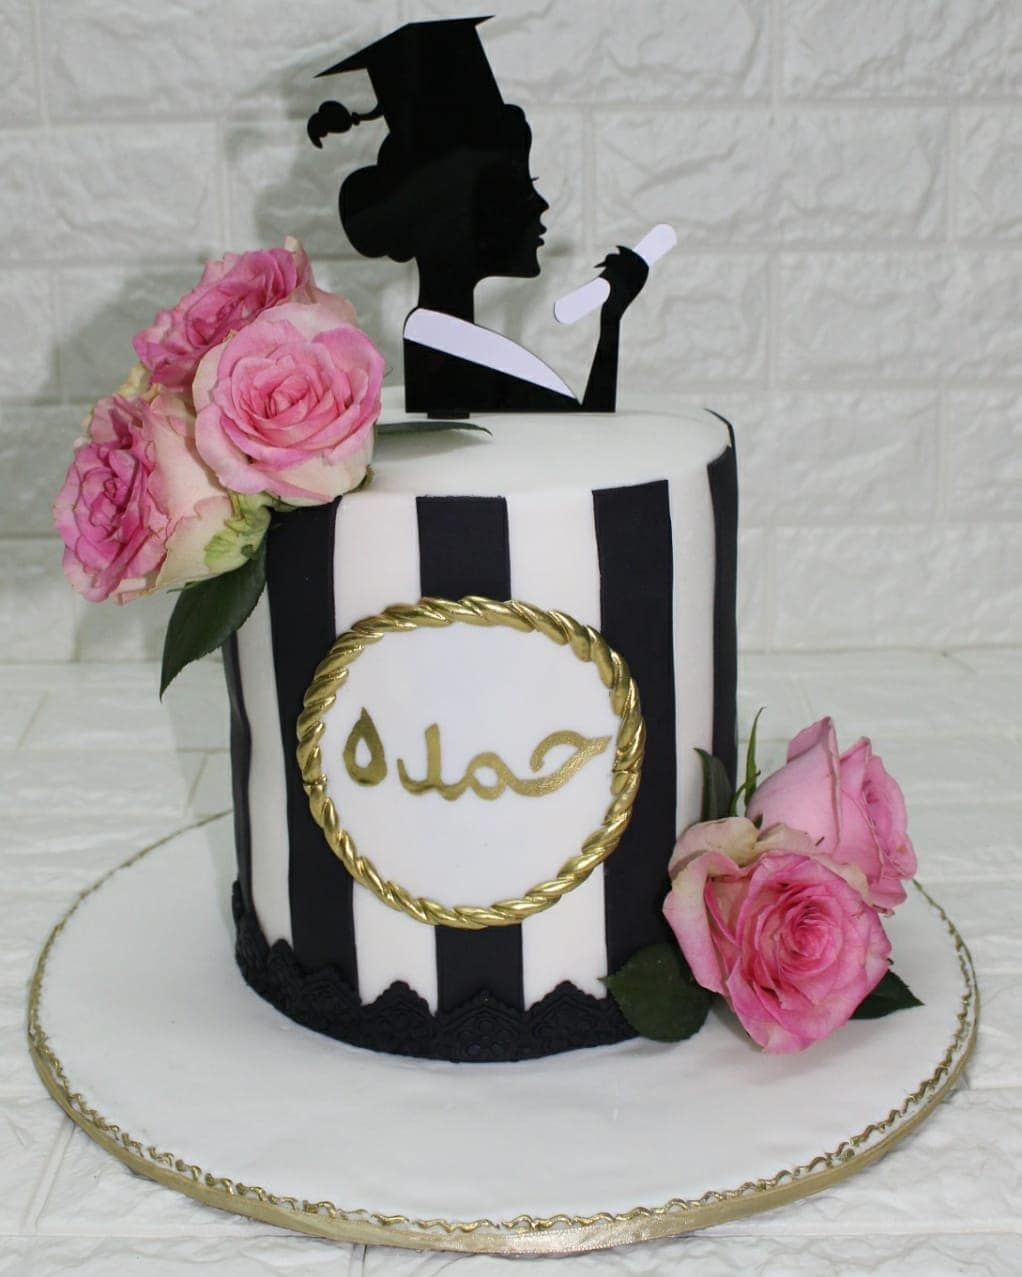 كيك زواج اعراس عرس كيك عيدميلاد سبايدرمان سوبرمان فرون يونك كيك بيبي كيك تخرج كيك ترقية نوتلا تشي Graduation Party Cake Soccer Cake Cake Decorating Videos